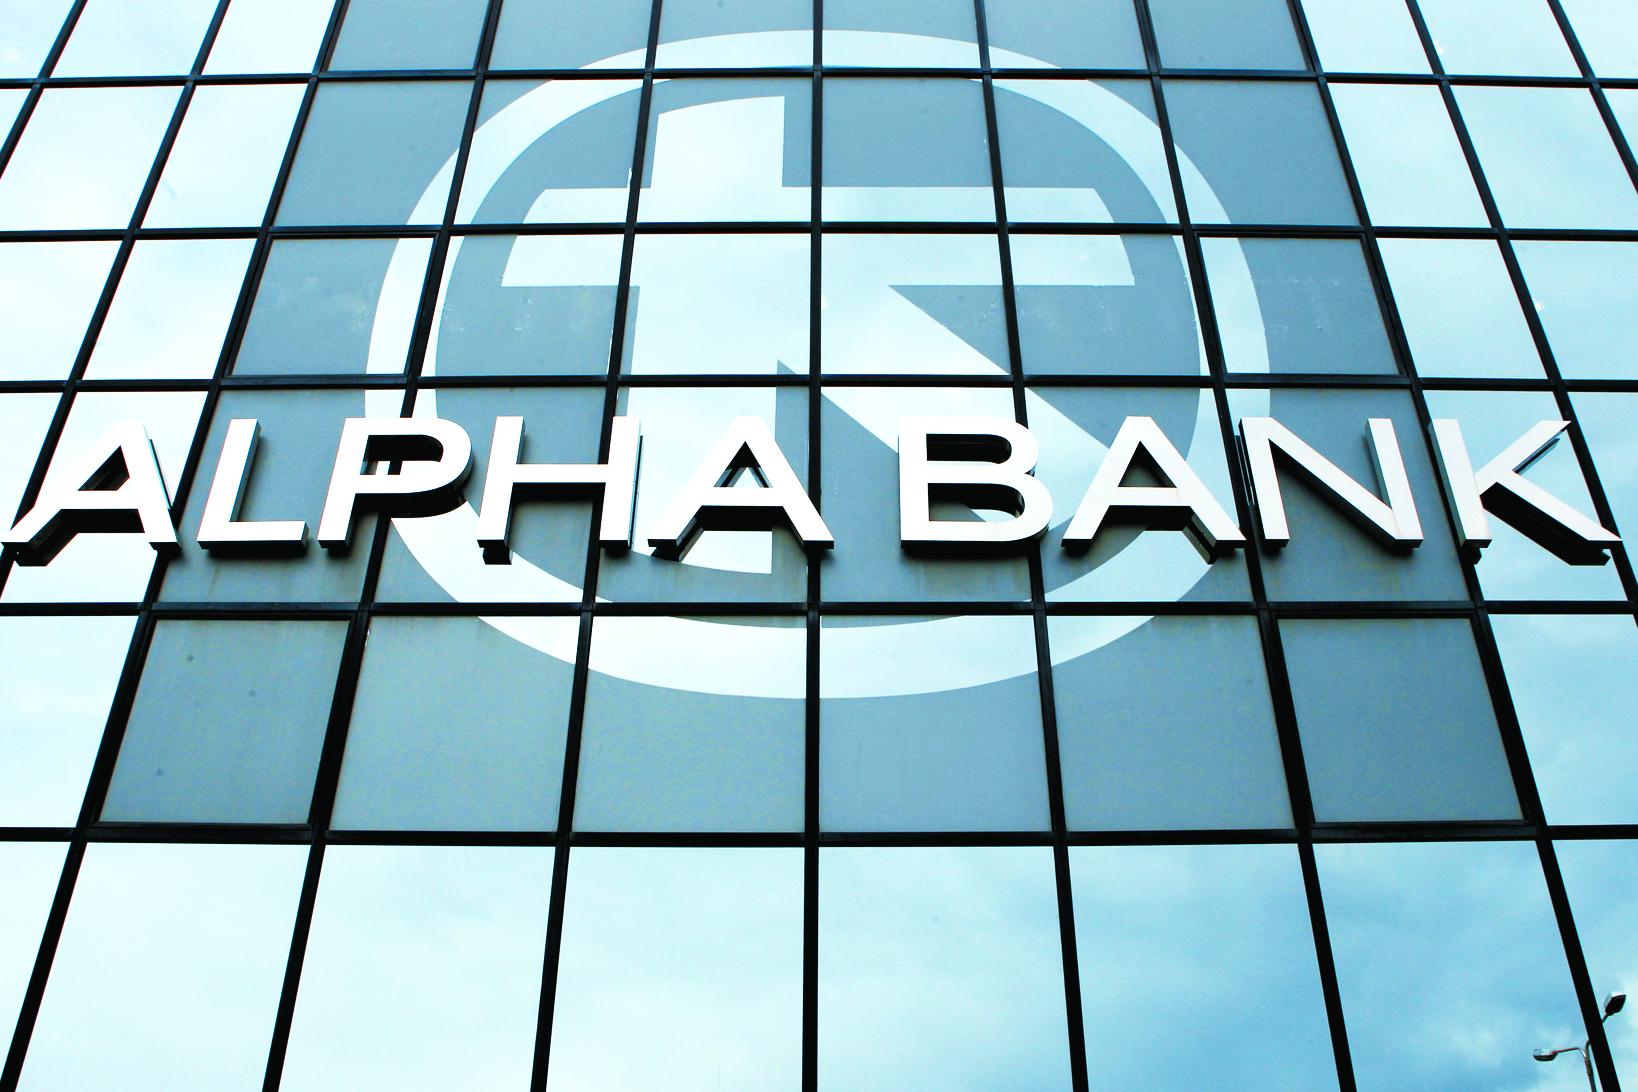 Alpha Bank: Ορατές οι ενδείξεις βελτίωσης και ανάκαμψης της ελληνικής οικονομίας | tovima.gr